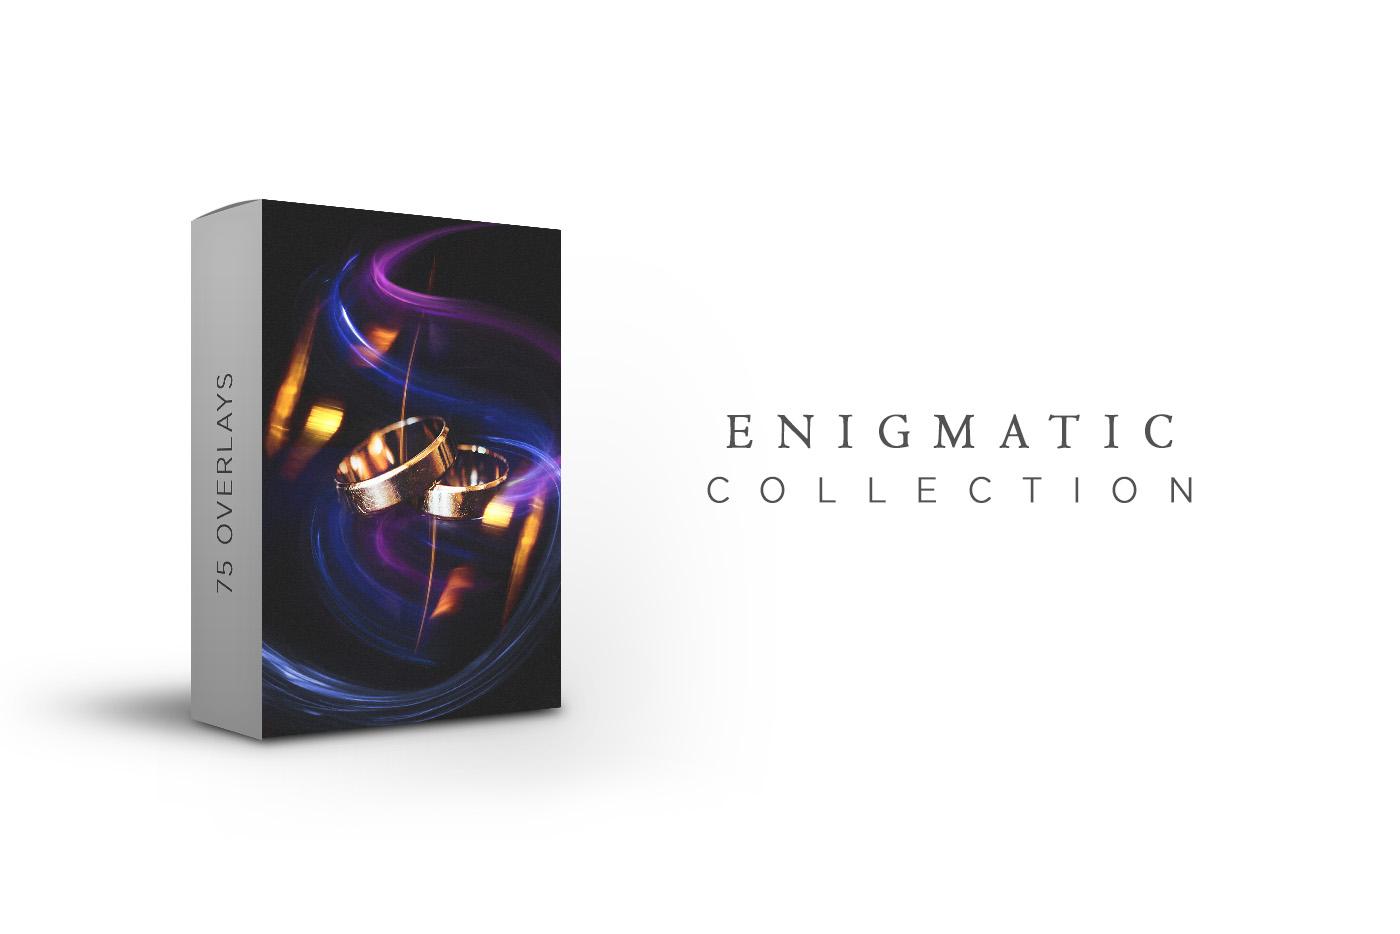 1200+ Wedding Bundle PS   LR items - 25 ENIGMA -